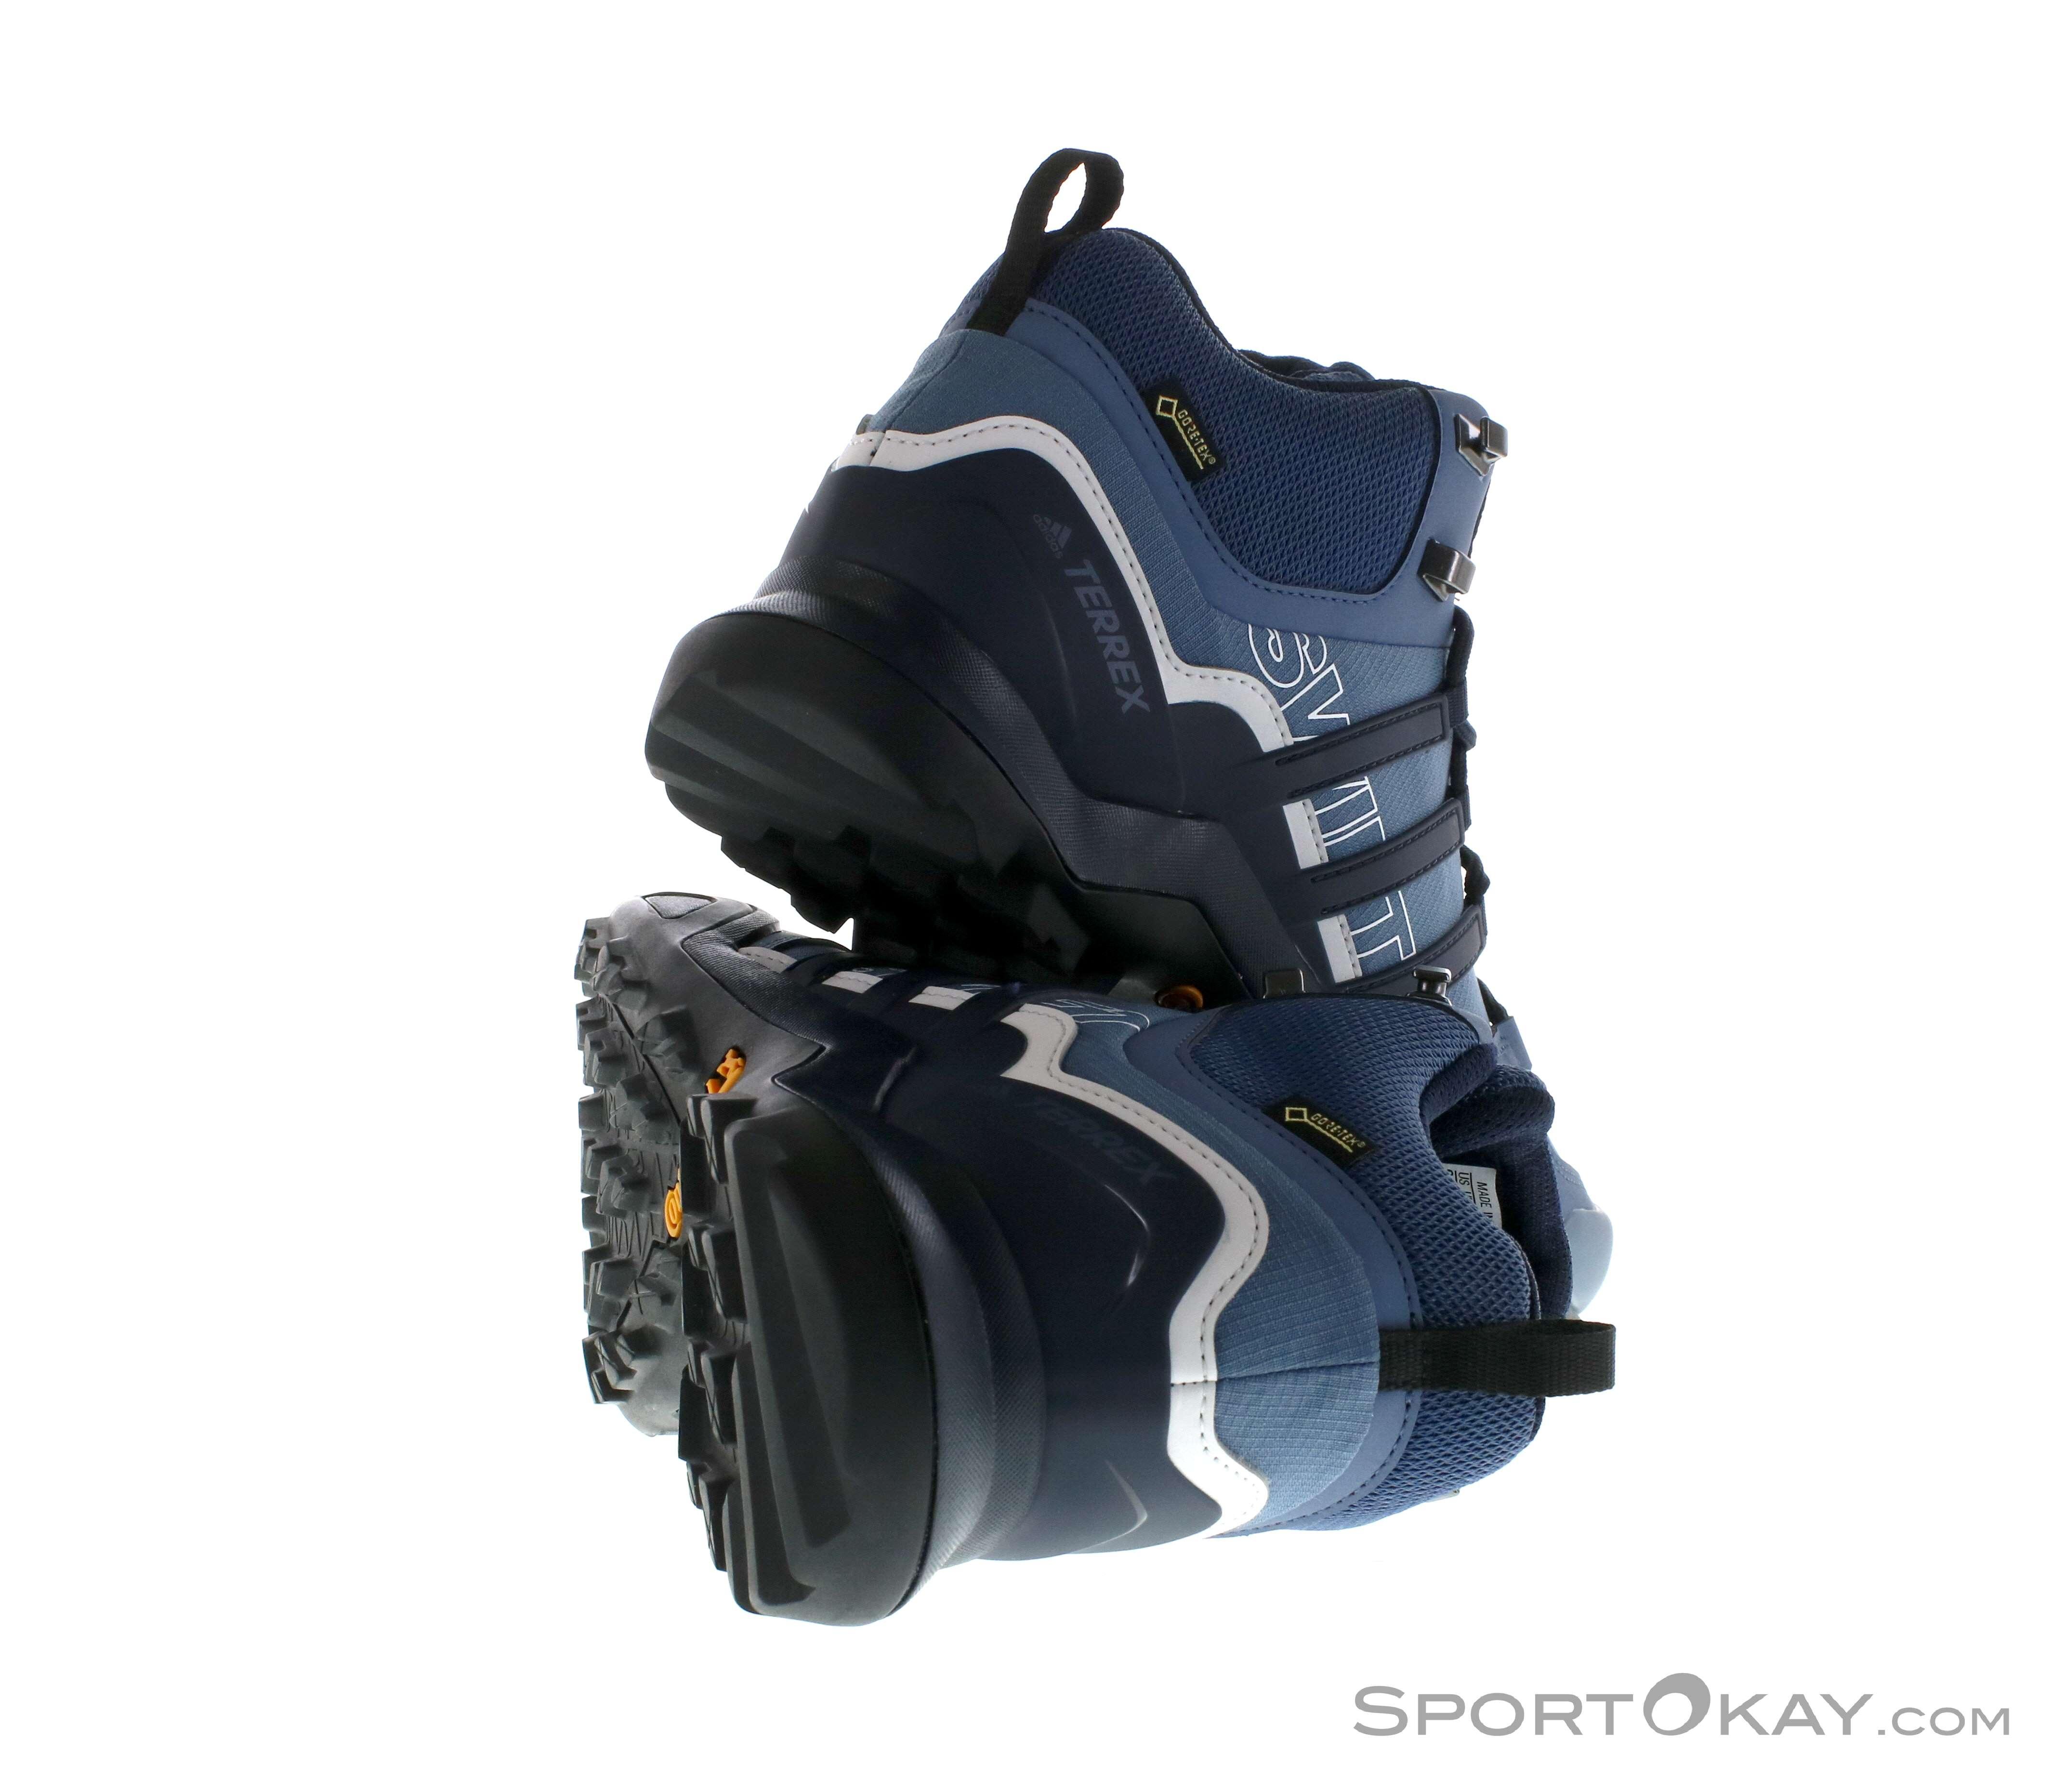 Mid Damen Terrex adidas R2 adidas Swift Trekkingschuhe Gore Tex 1JcTlF3K